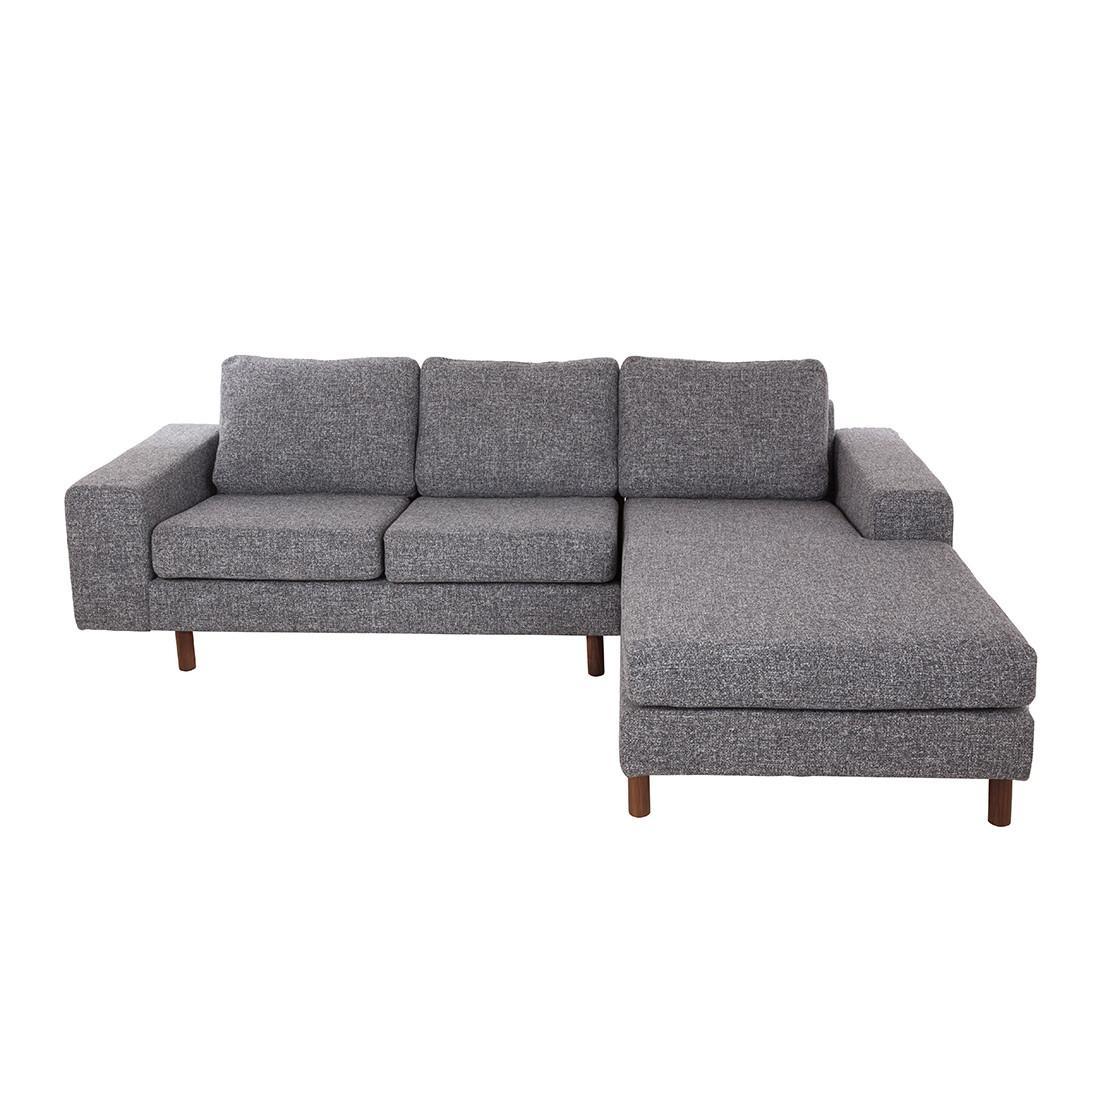 Sofas: Mid Century Settee | Mid Century Sofas | Cheap Mid Century In Cheap Retro Sofas (View 11 of 20)